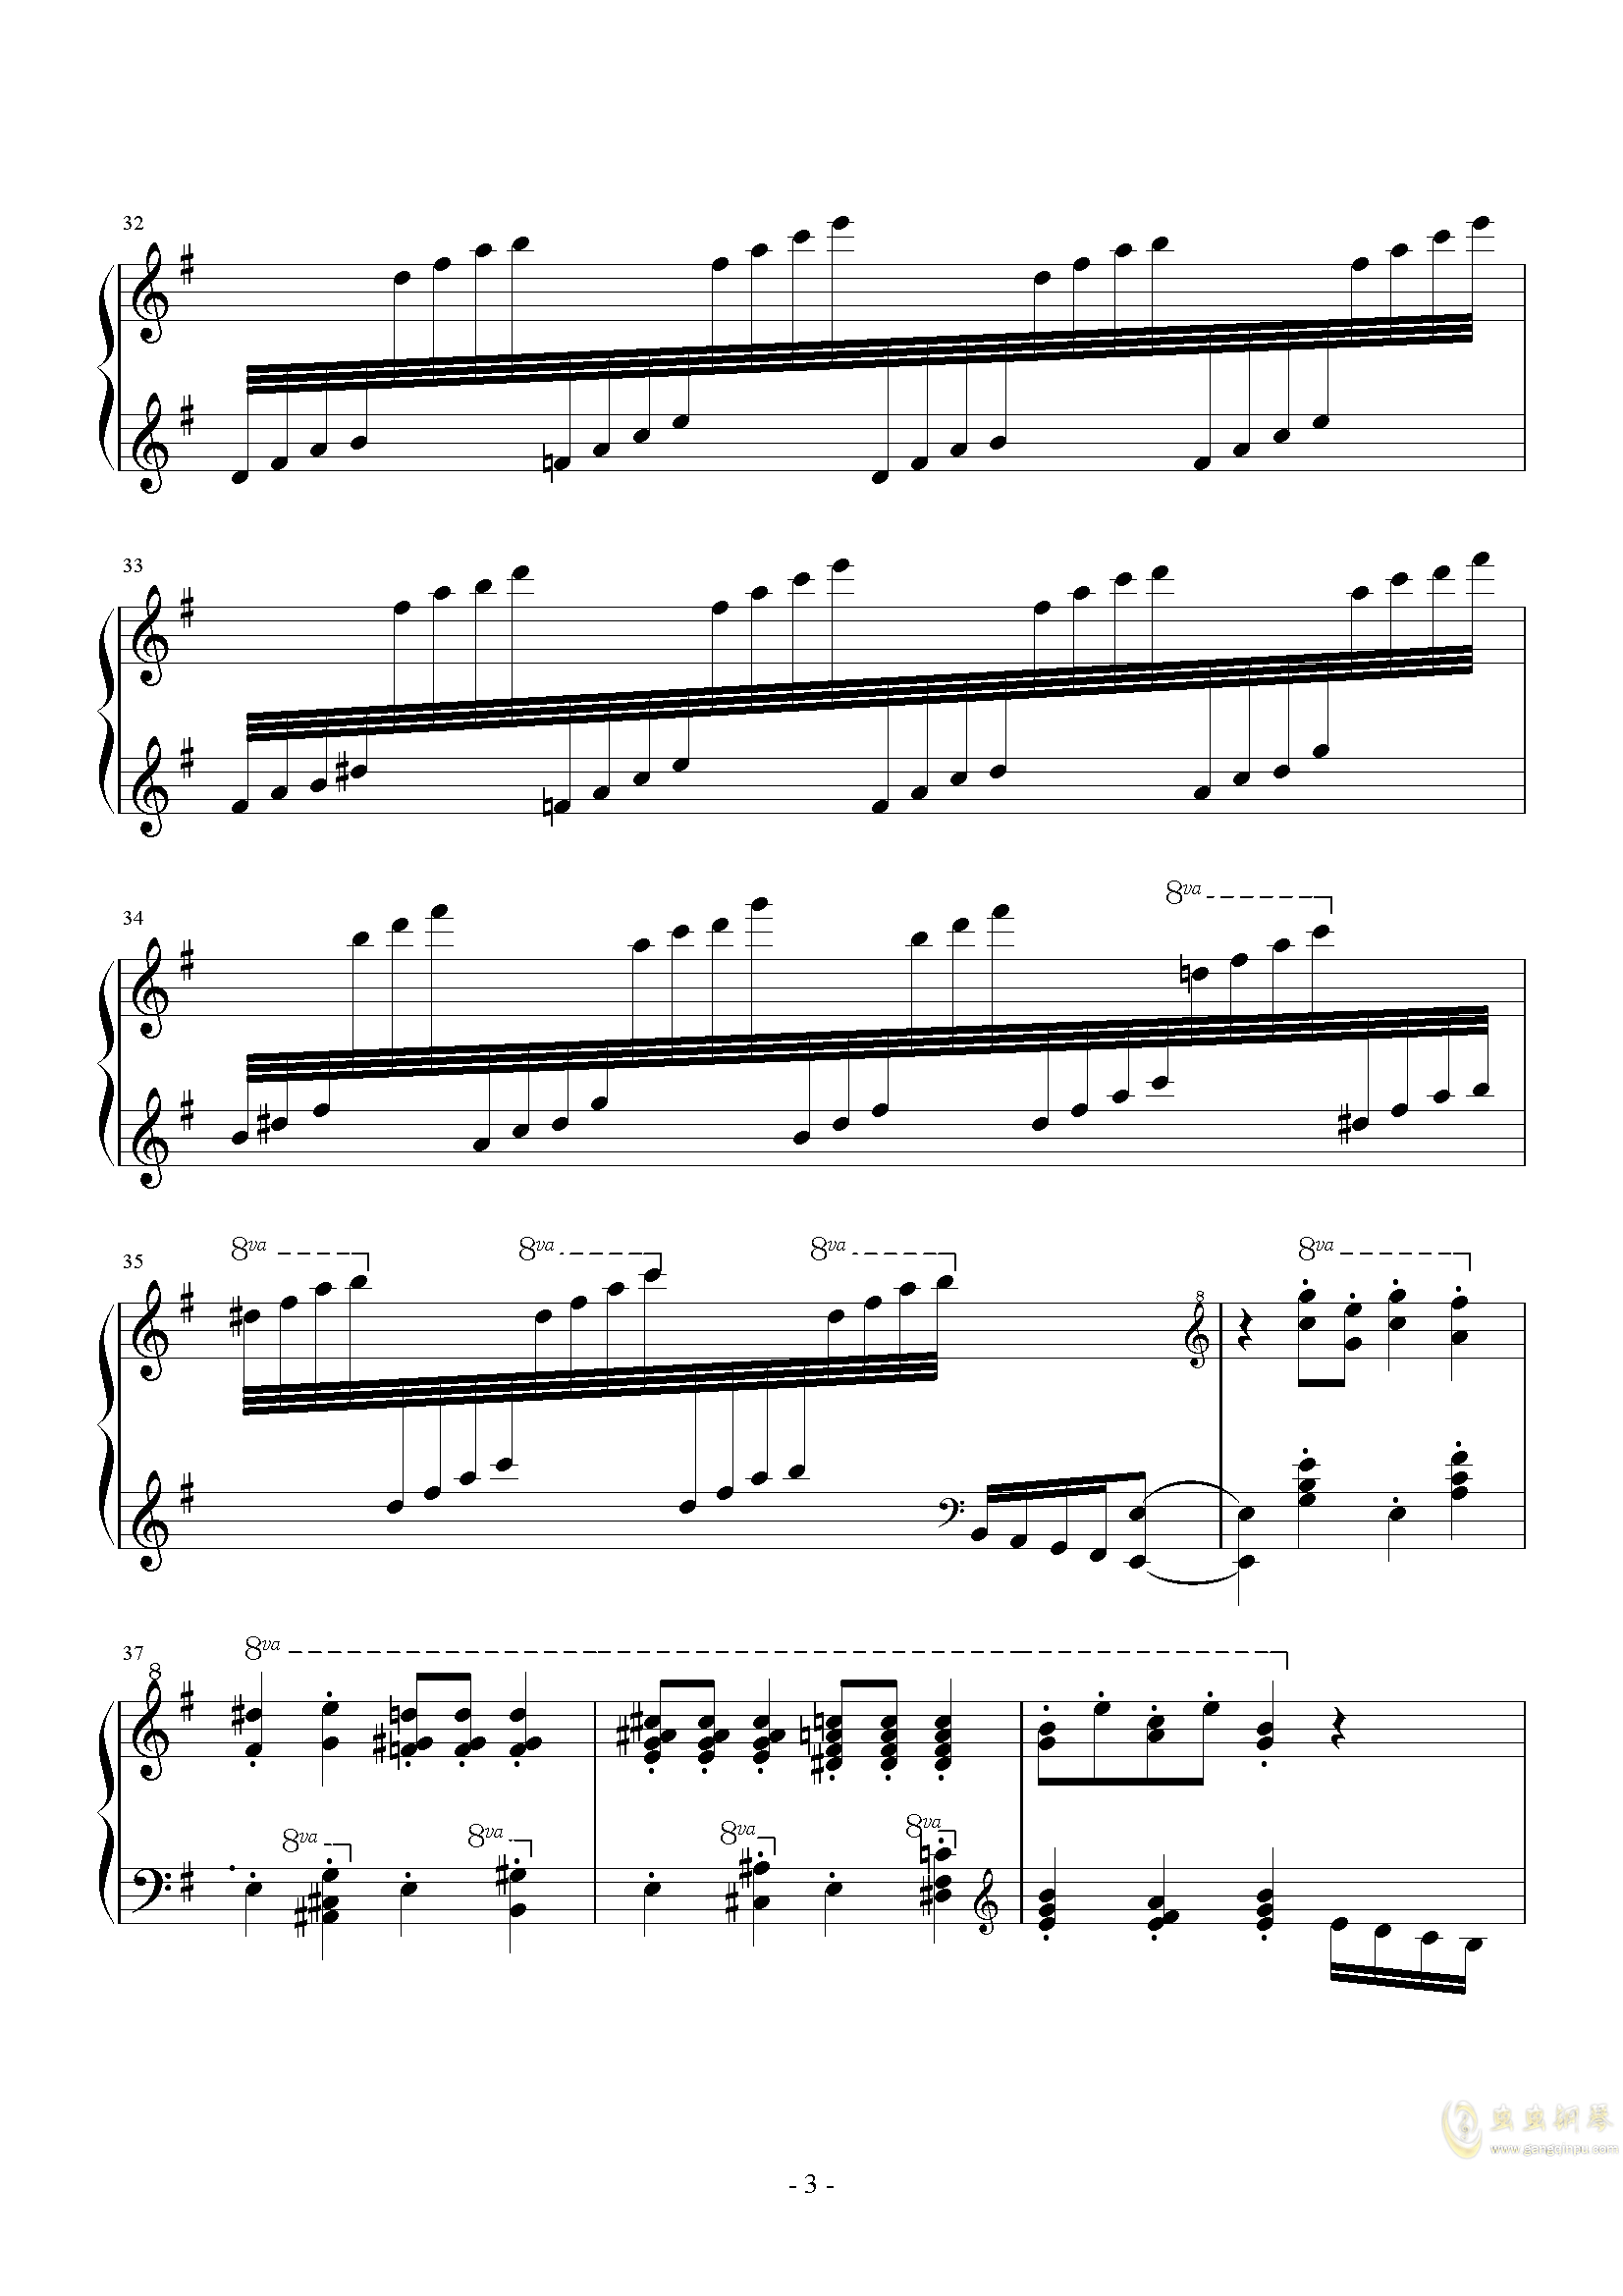 Dance of the Sugar Plum Fairy钢琴谱 第3页